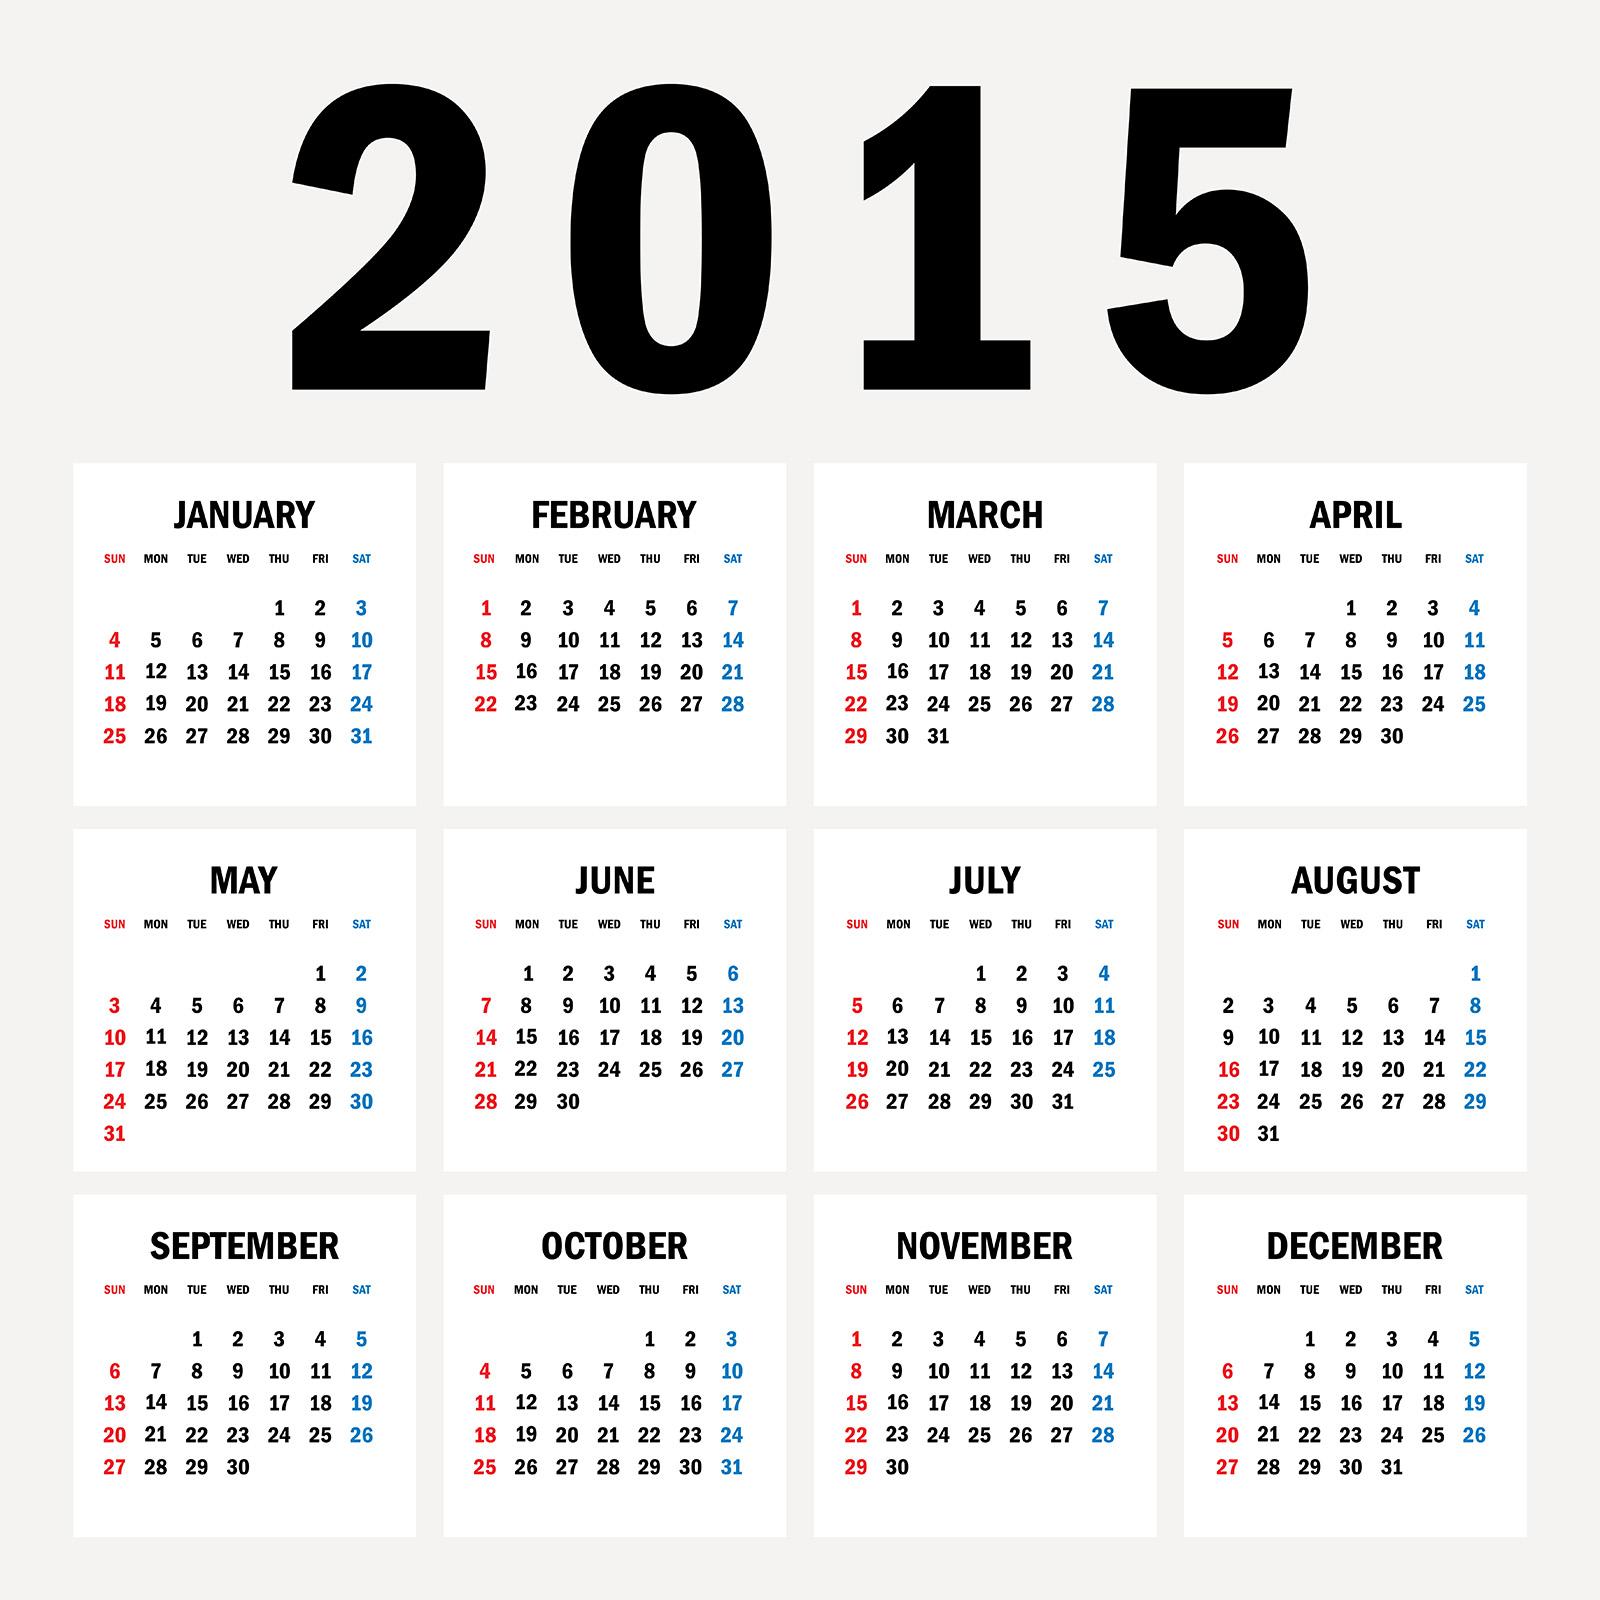 7087 × 7087 pixels 2015カレンダー : 2015カレンダー無料ダウンロード : カレンダー